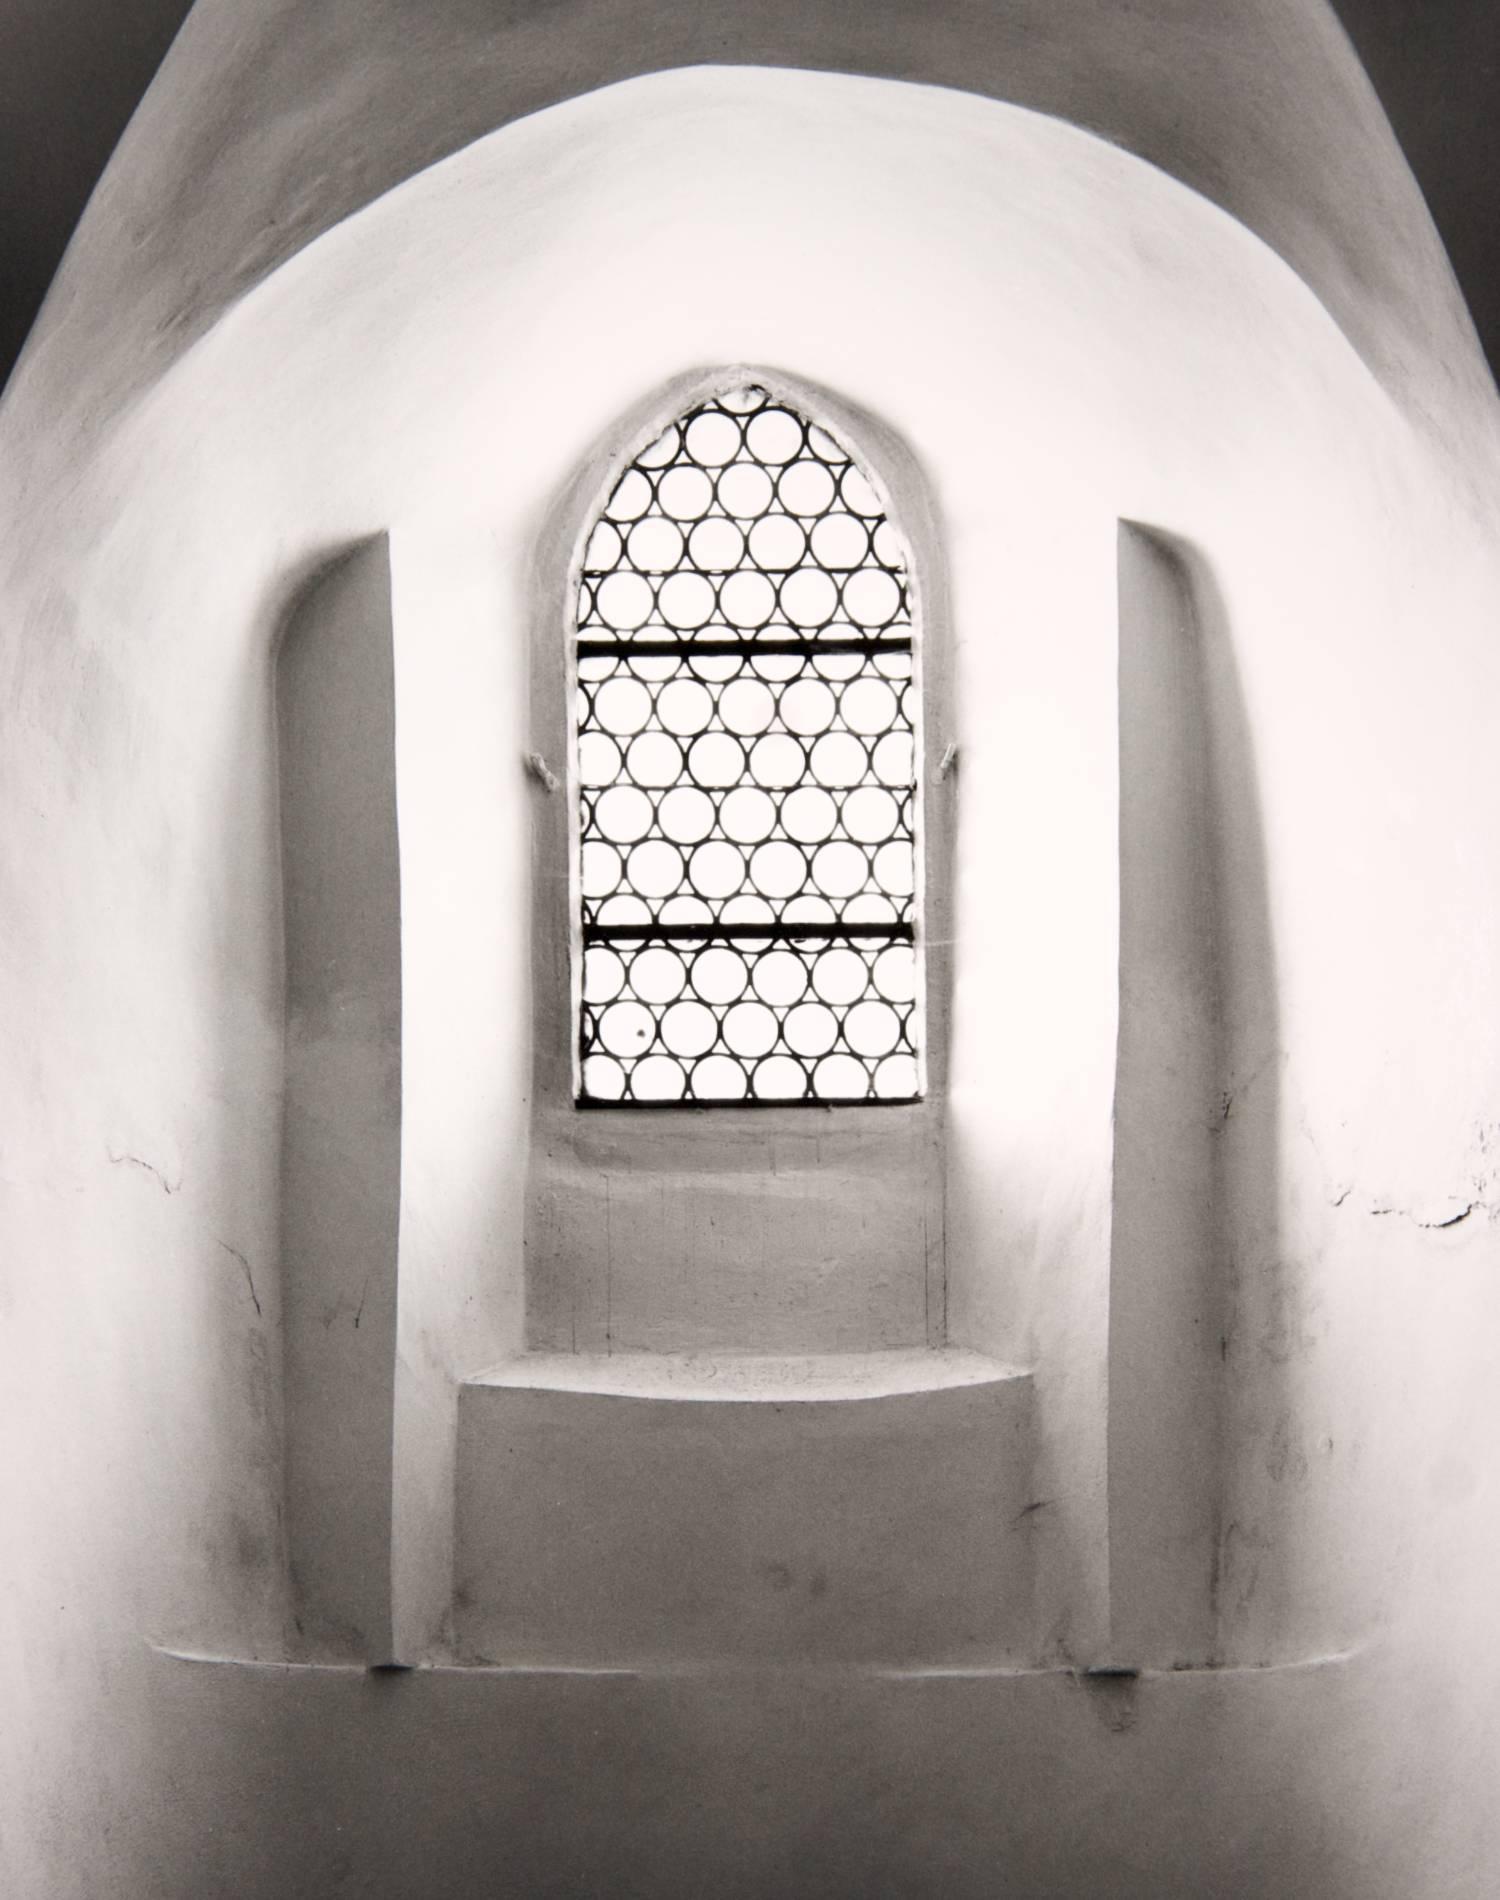 Window at St. Emmeram (Regensburg, Germany)